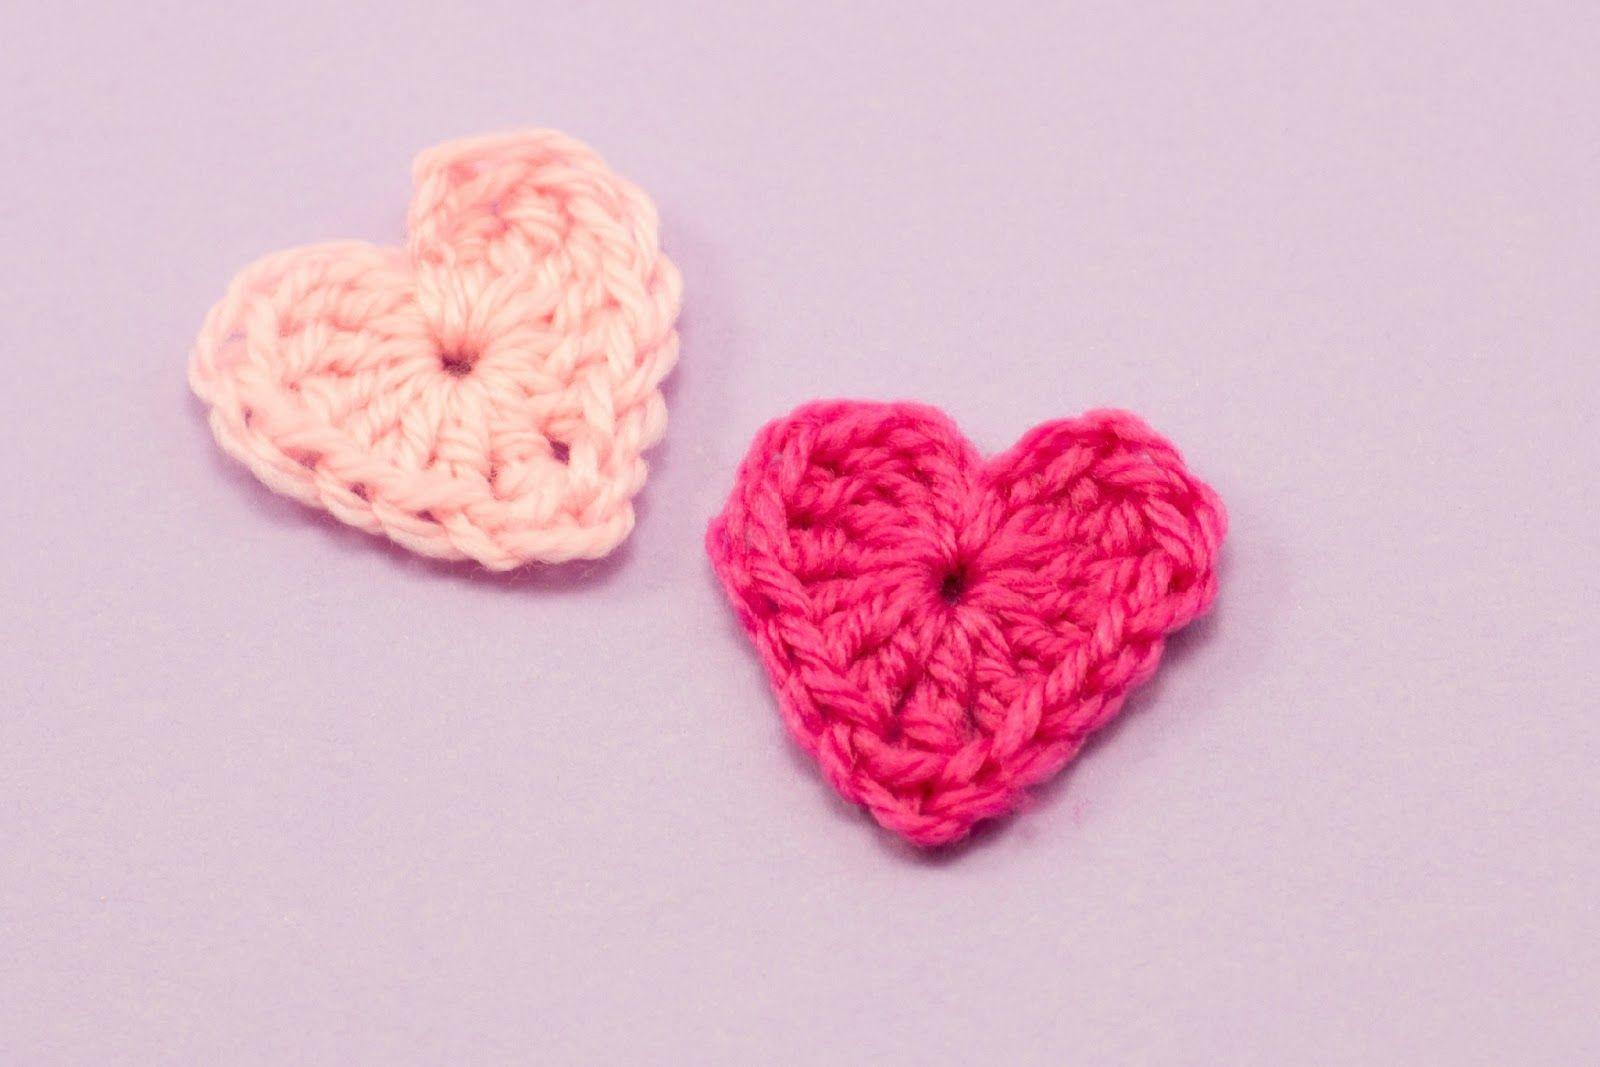 Easy Heart Crochet Pattern | Crochet | Pinterest | Diy häkeln ...